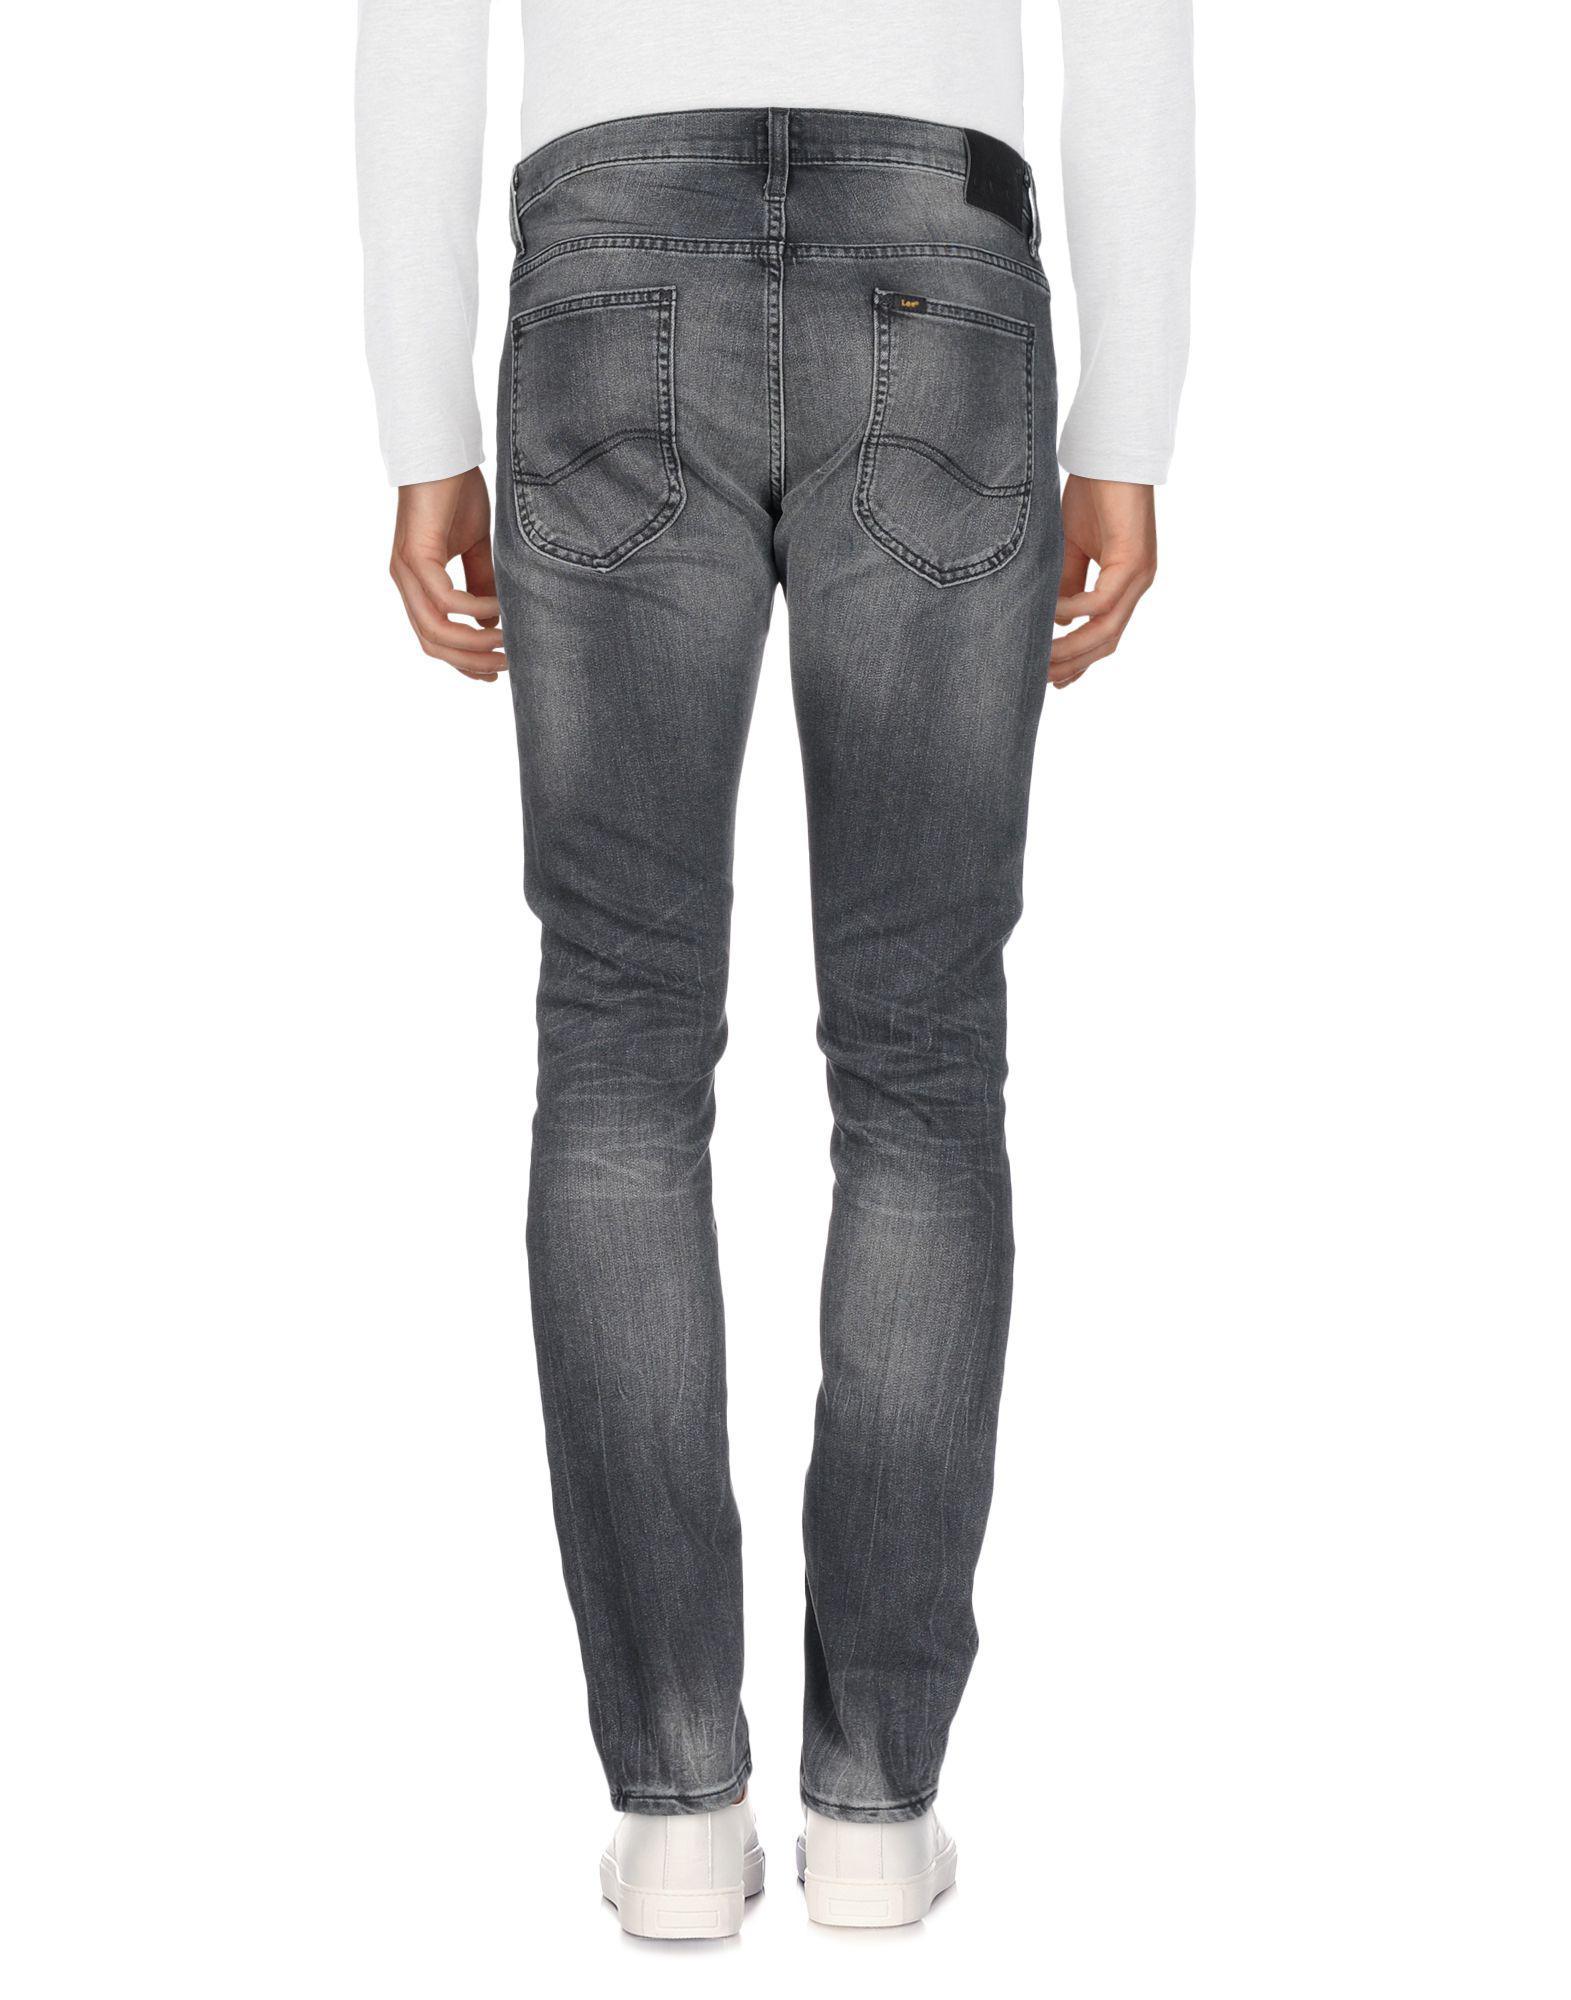 Lee Jeans Denim Trousers in Steel Grey (Grey) for Men